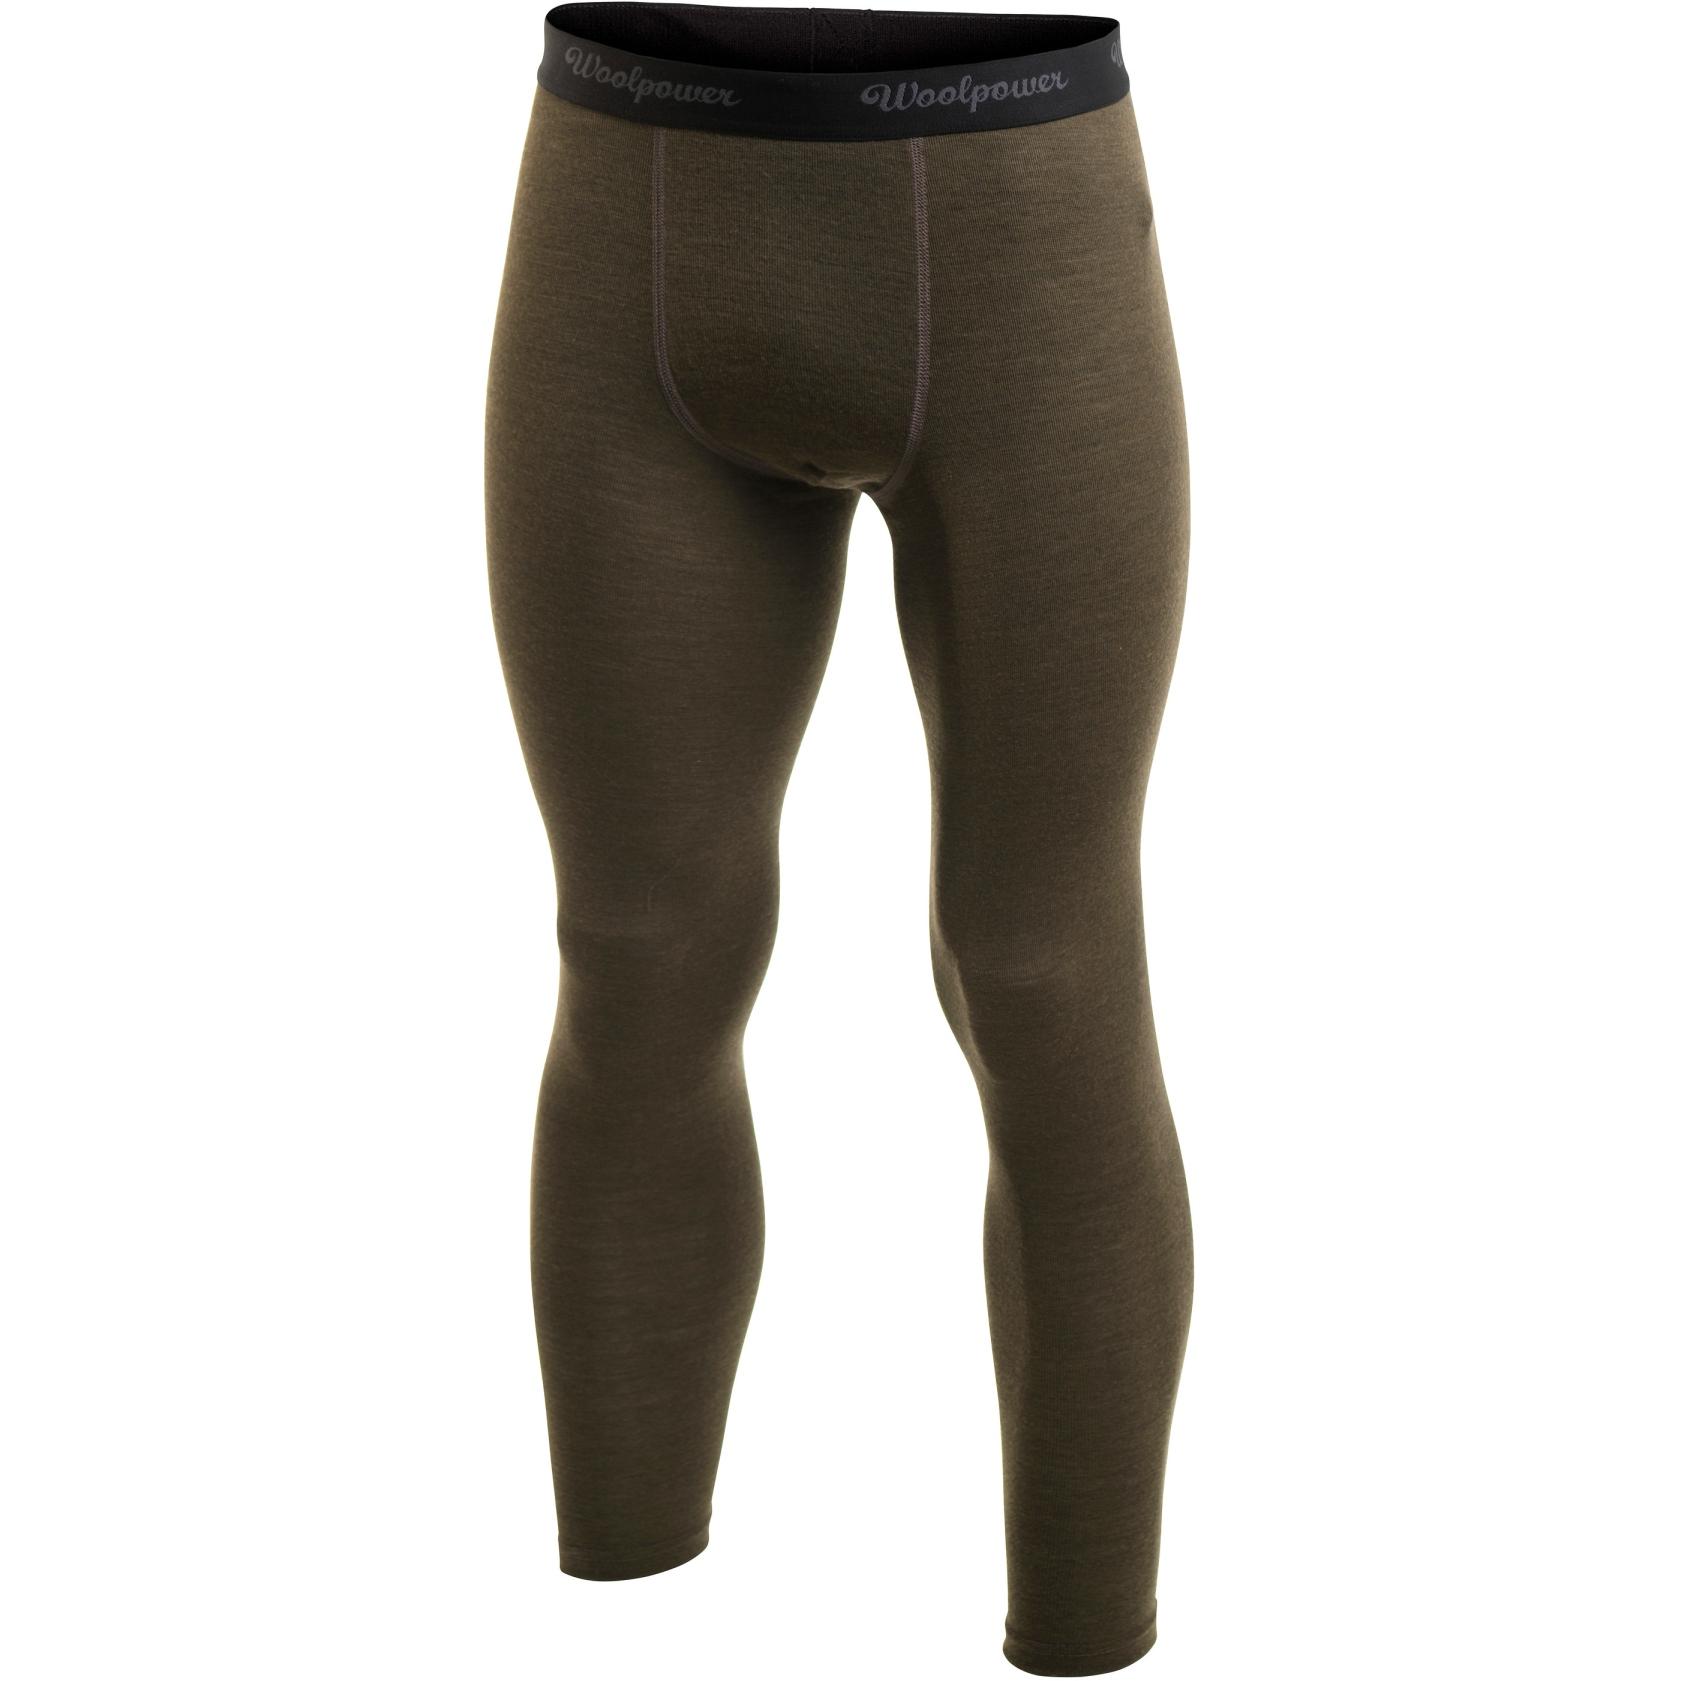 Woolpower Long Johns LITE Underpants/Tights - pine green